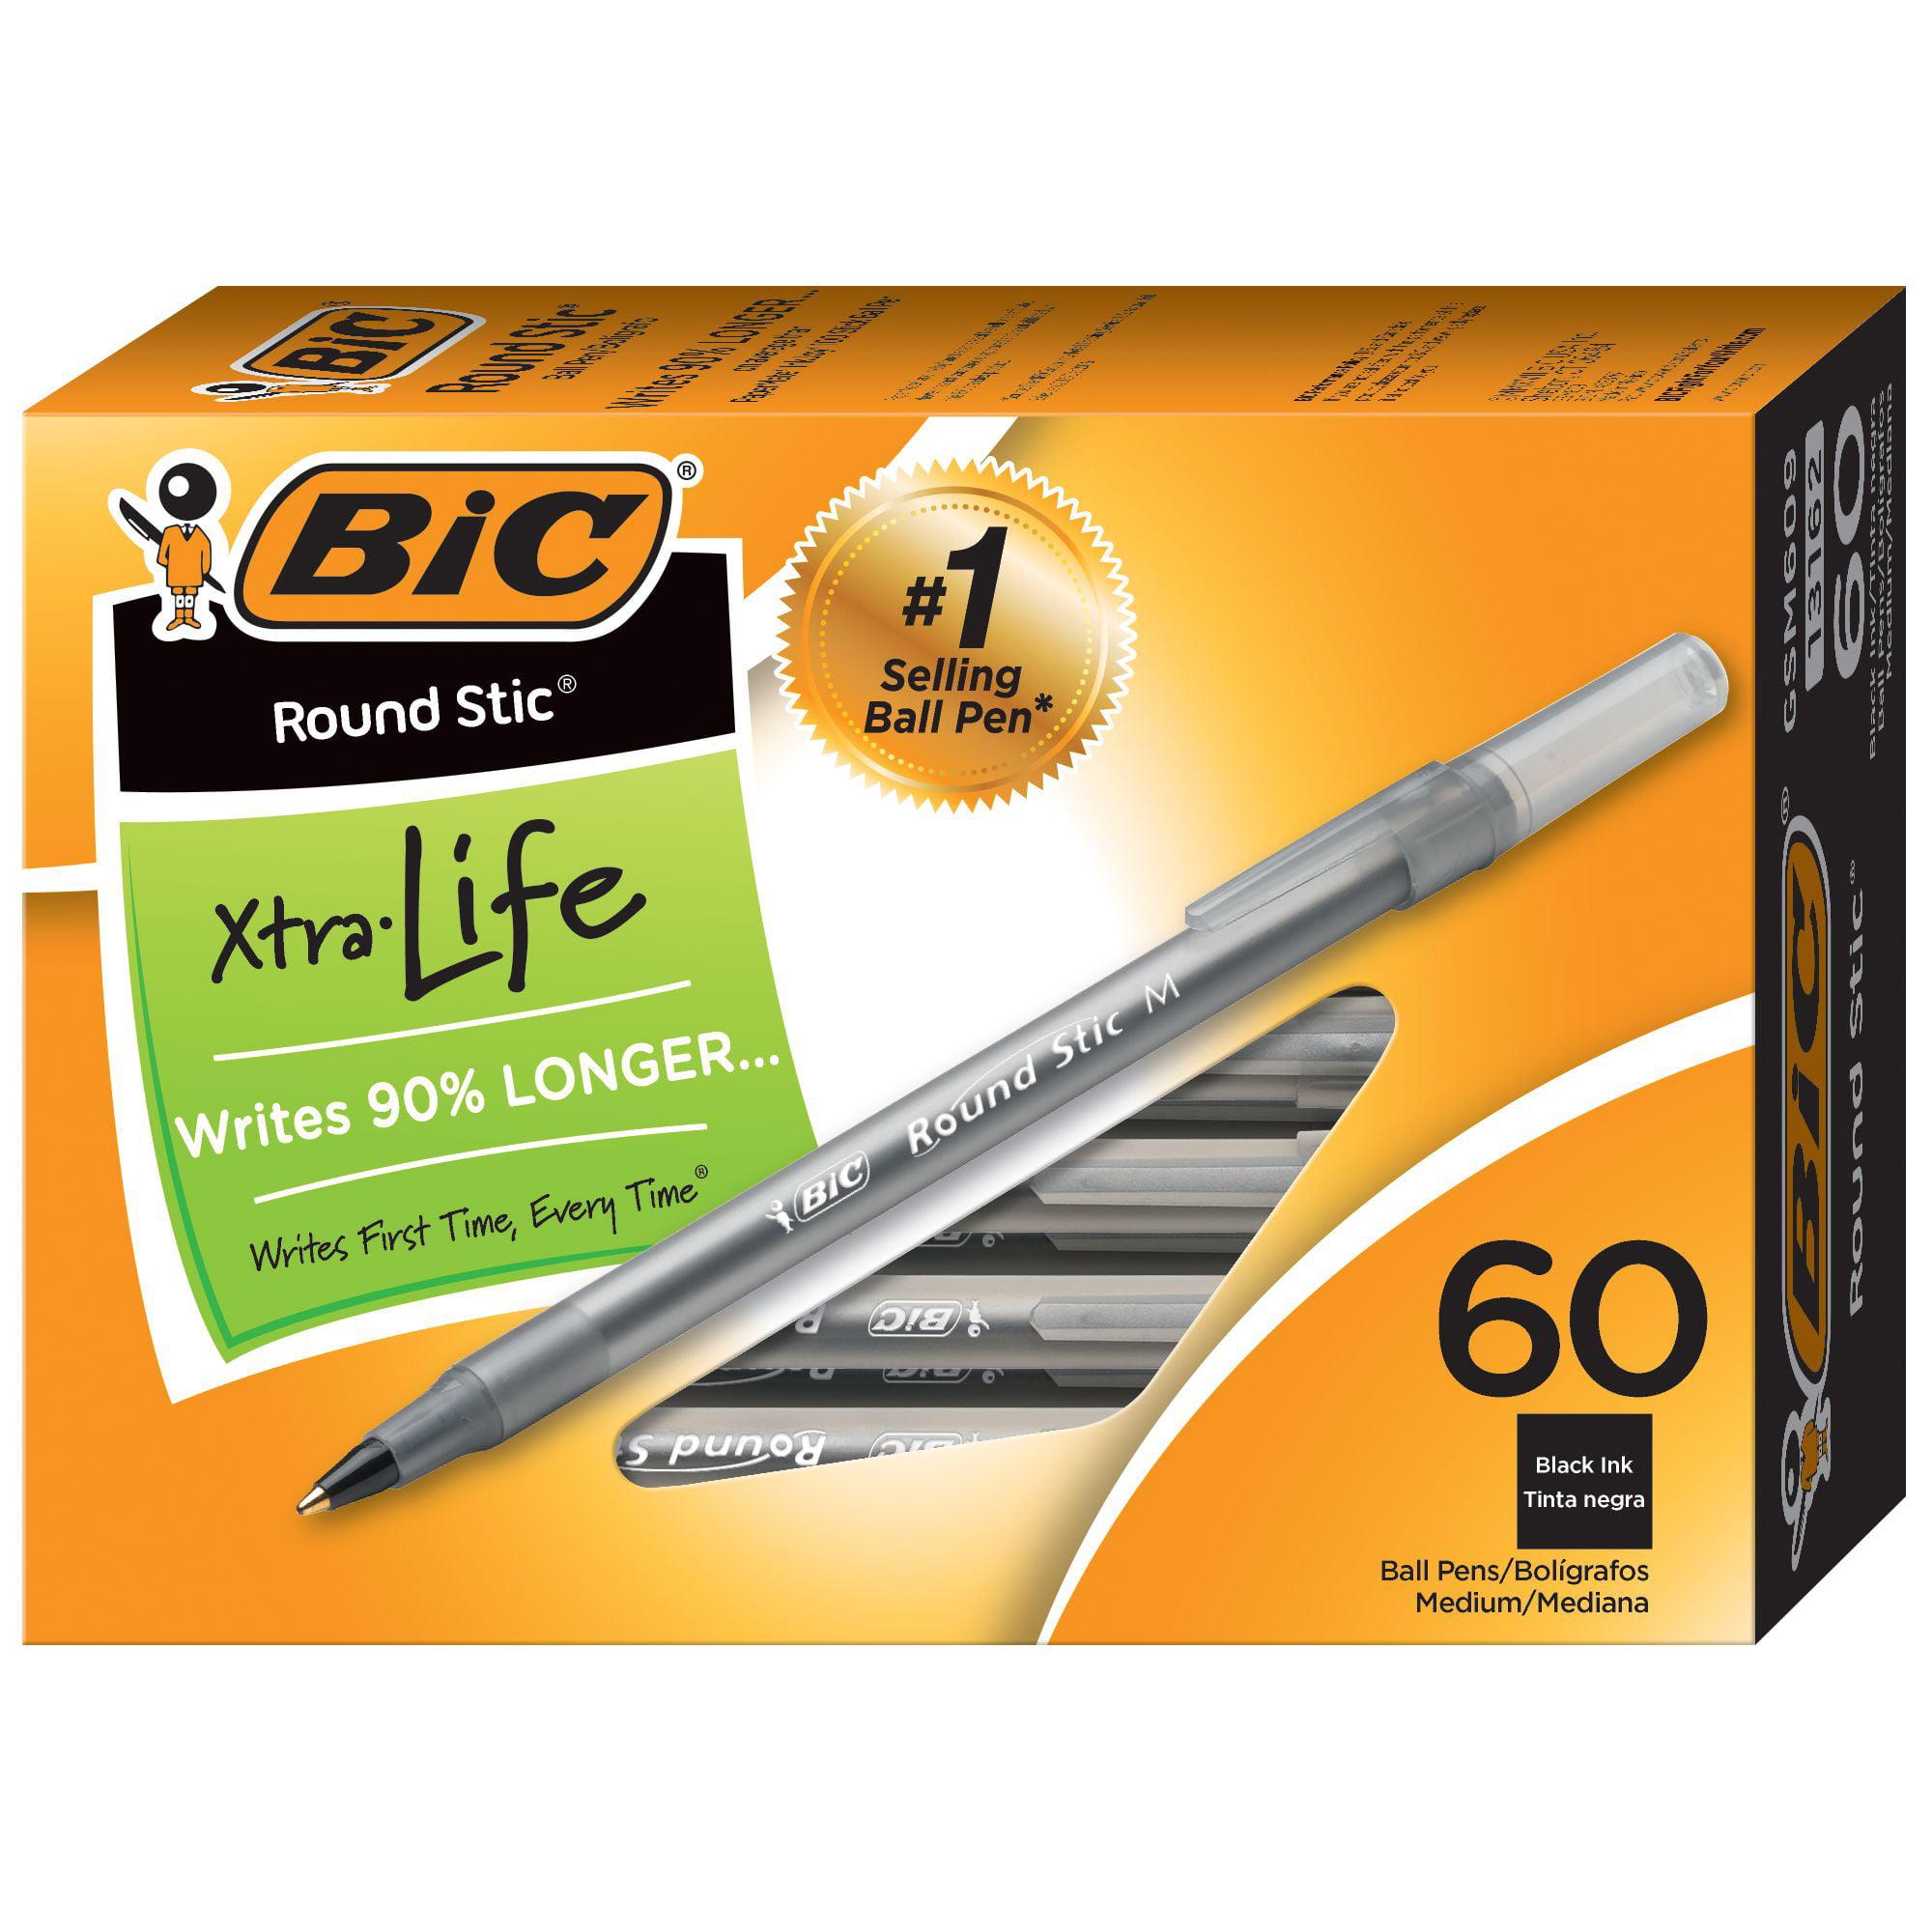 Medium Point 144 ct Pack of 6 BIC Round Stic Xtra Life Ballpoint Pen